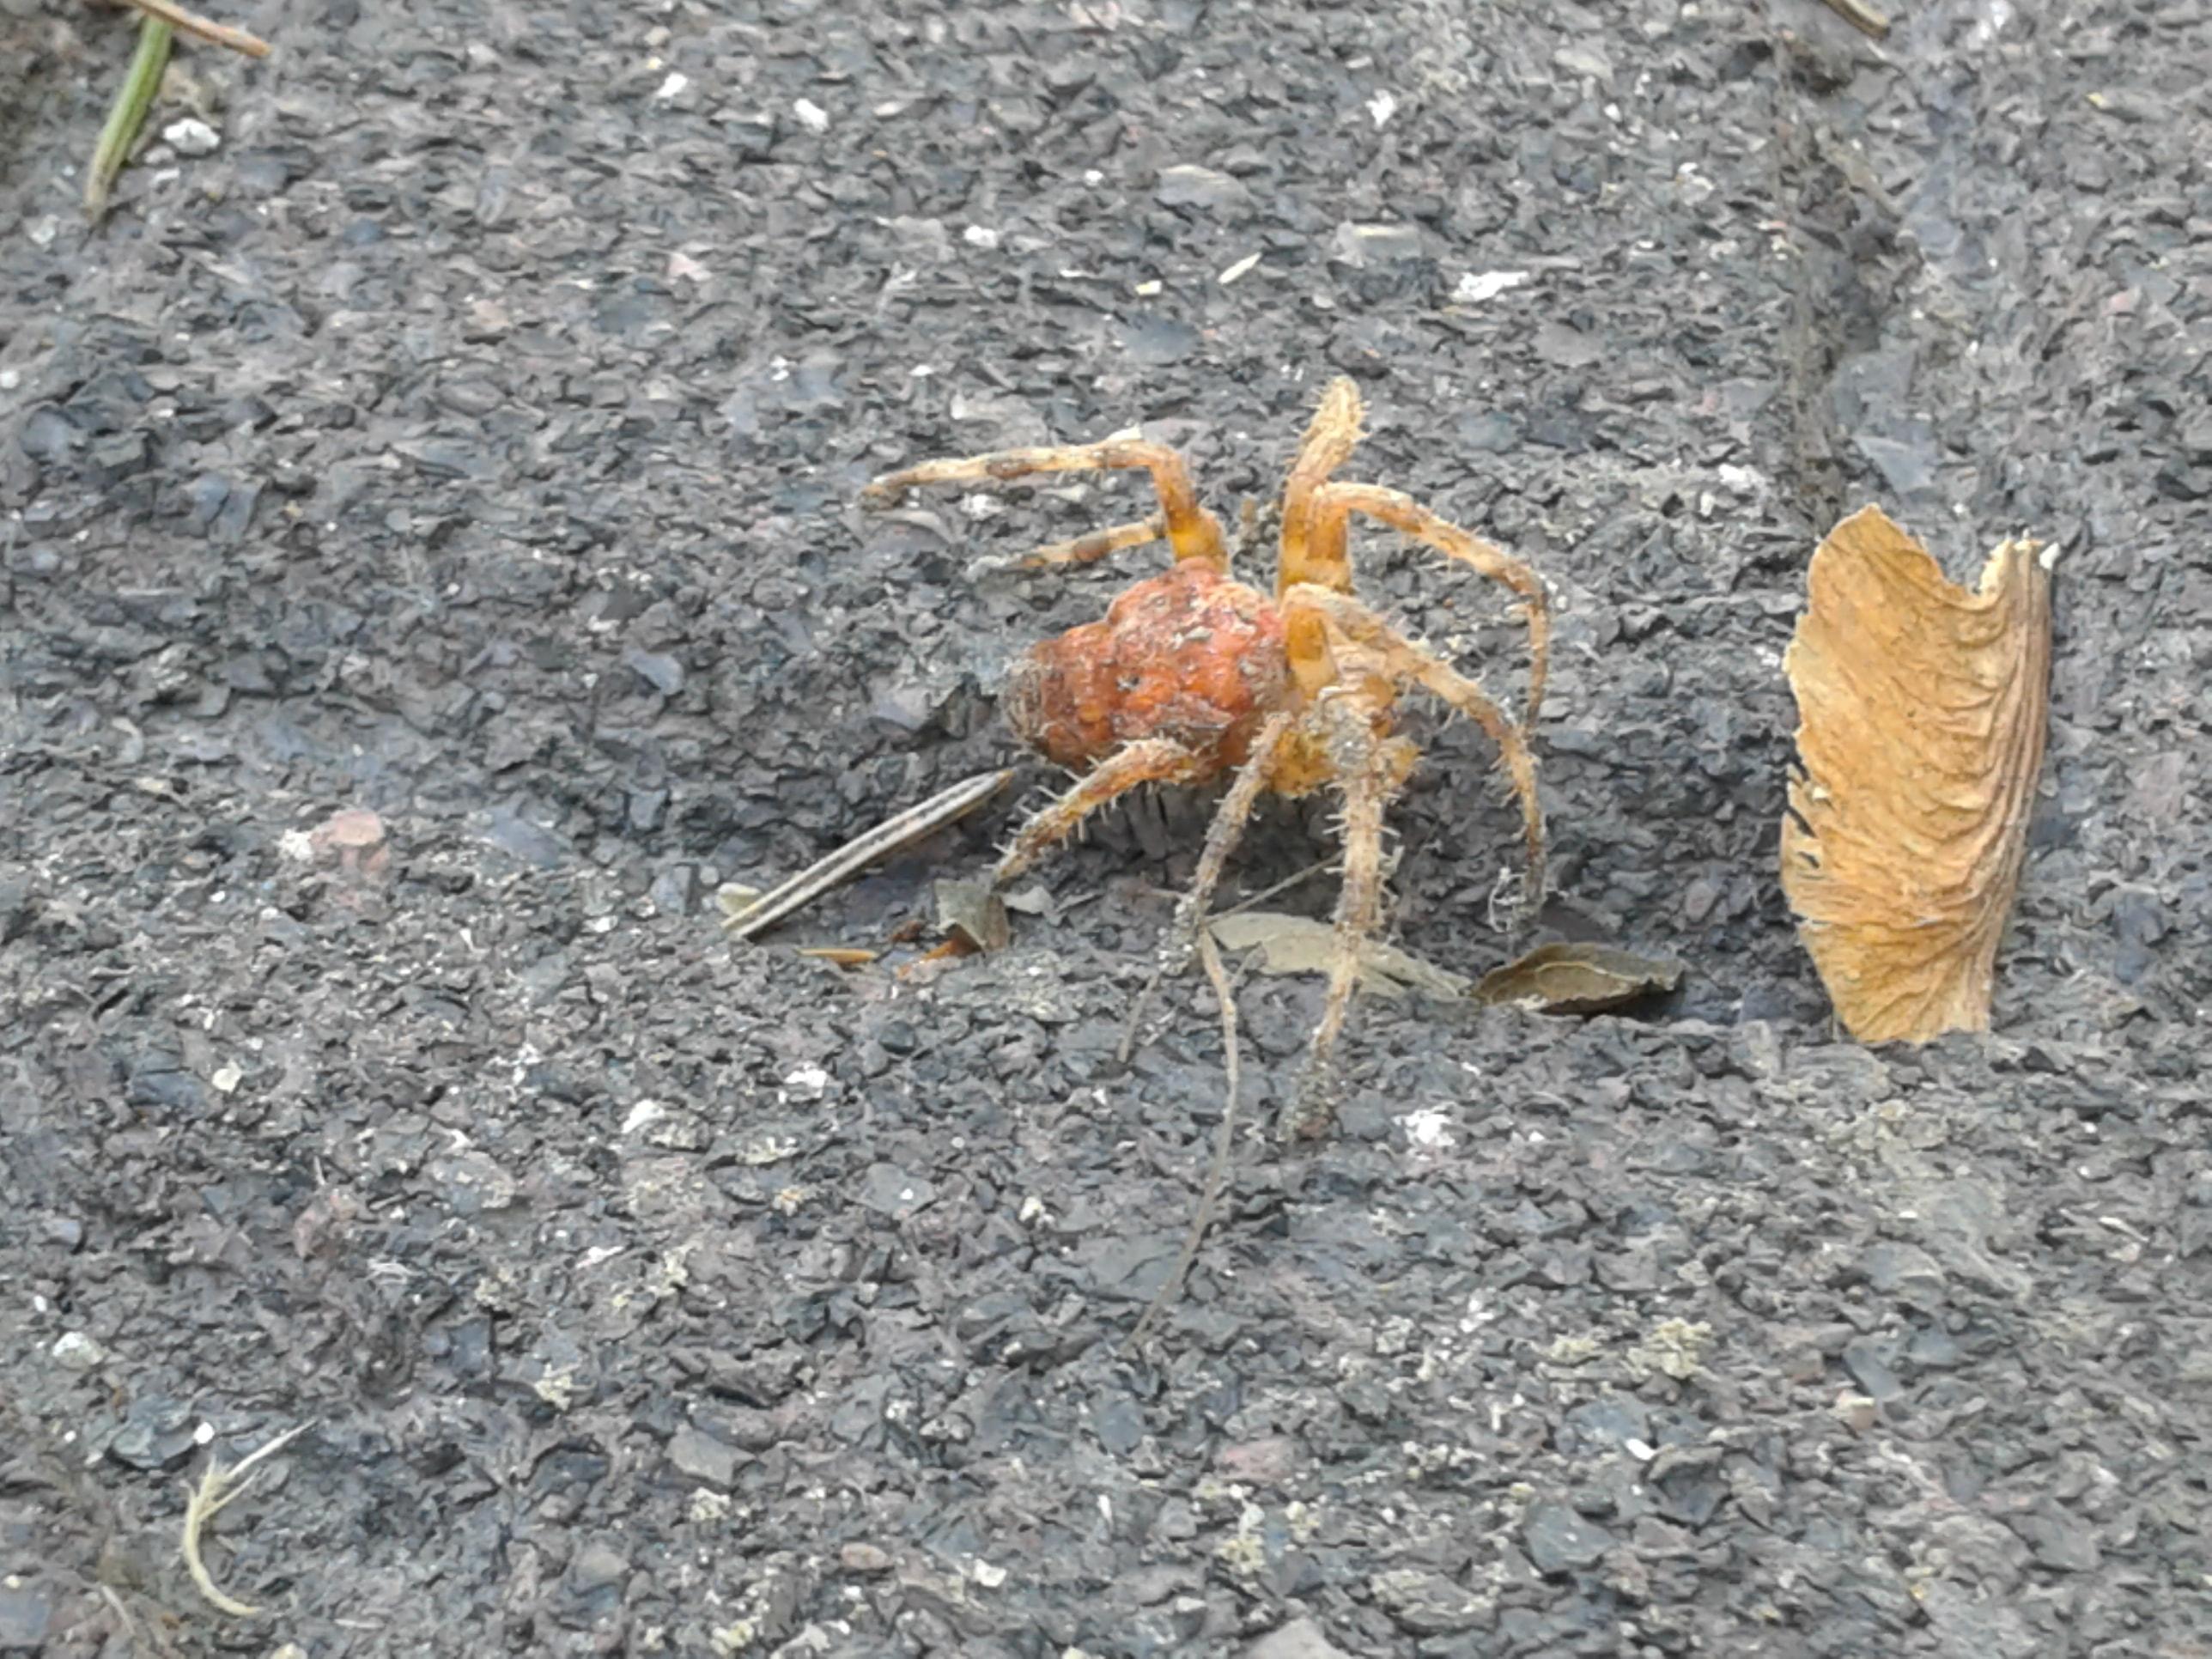 Picture of Araneus diadematus (Cross Orb-weaver) - Female - Lateral